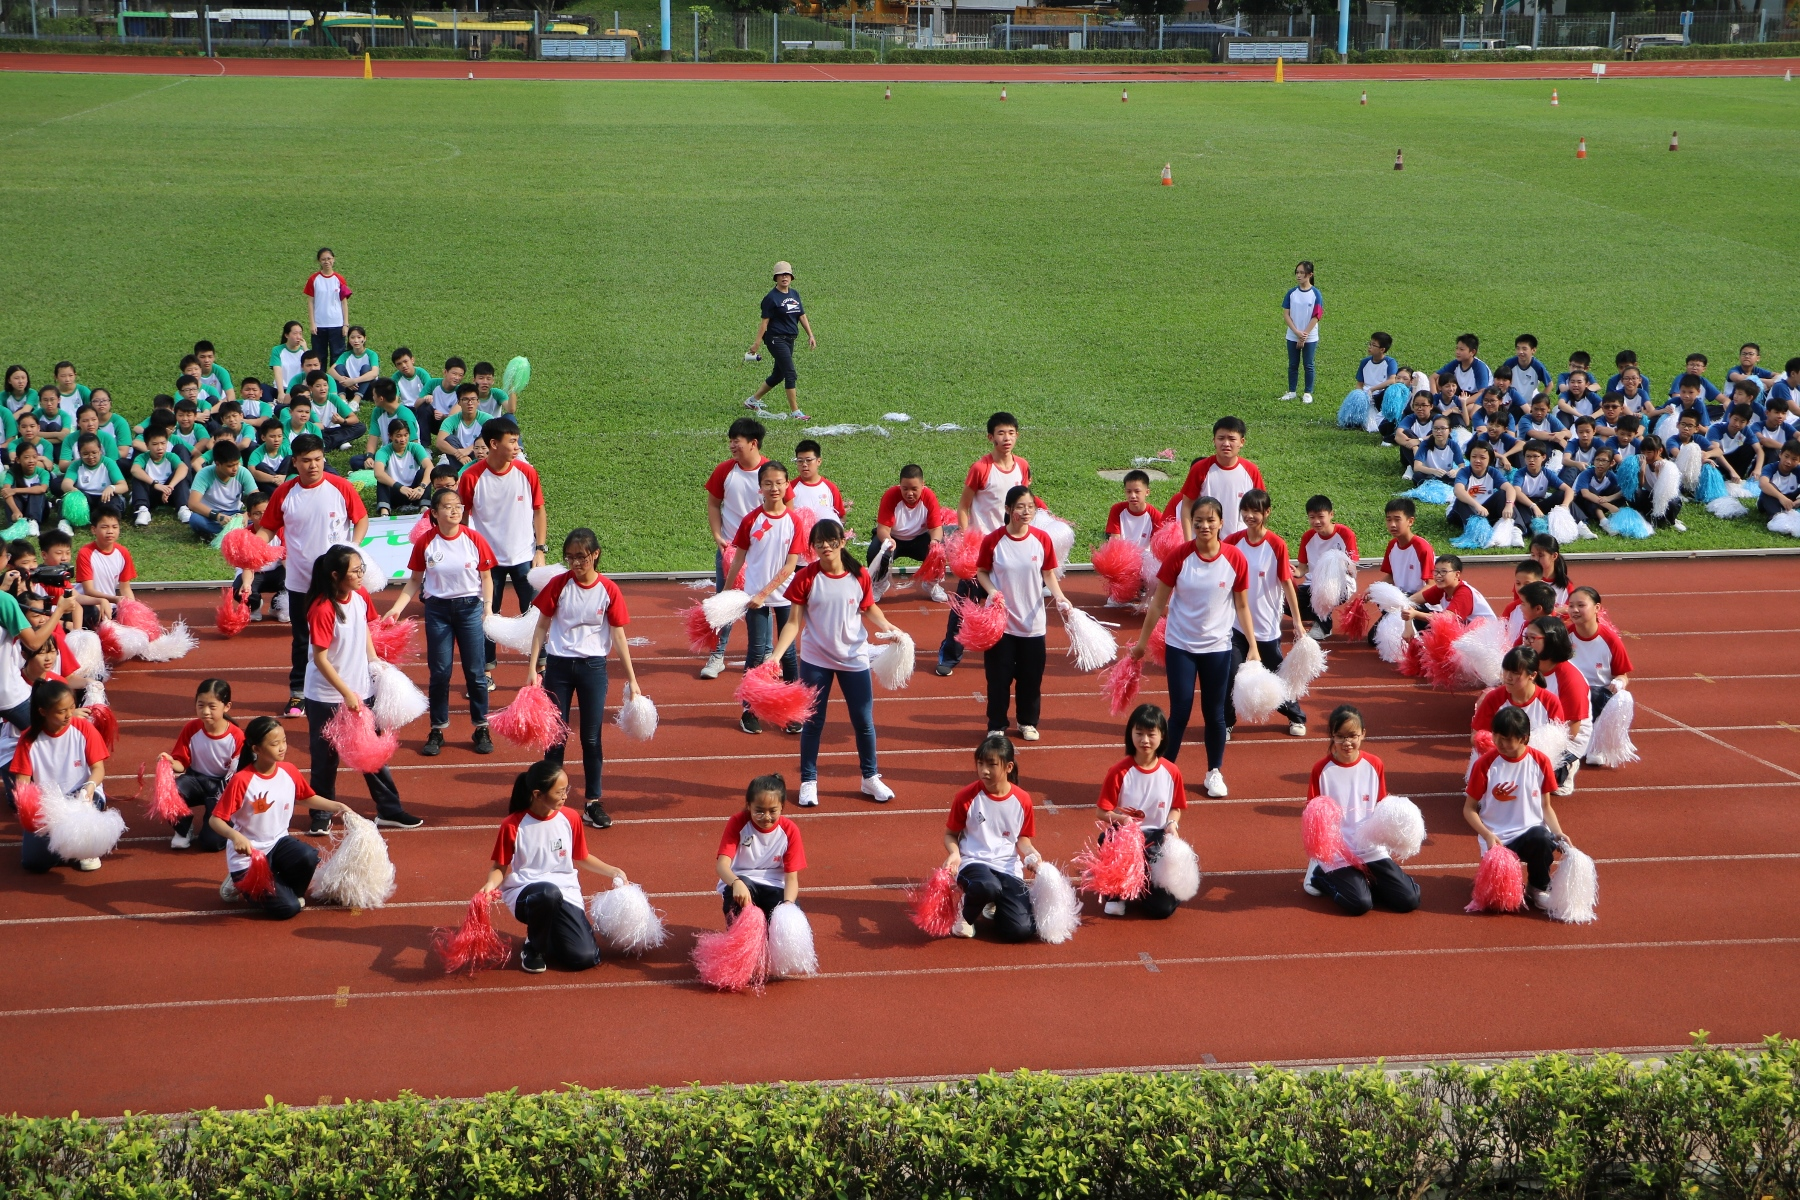 https://www.npc.edu.hk/sites/default/files/img_0030_2.jpg